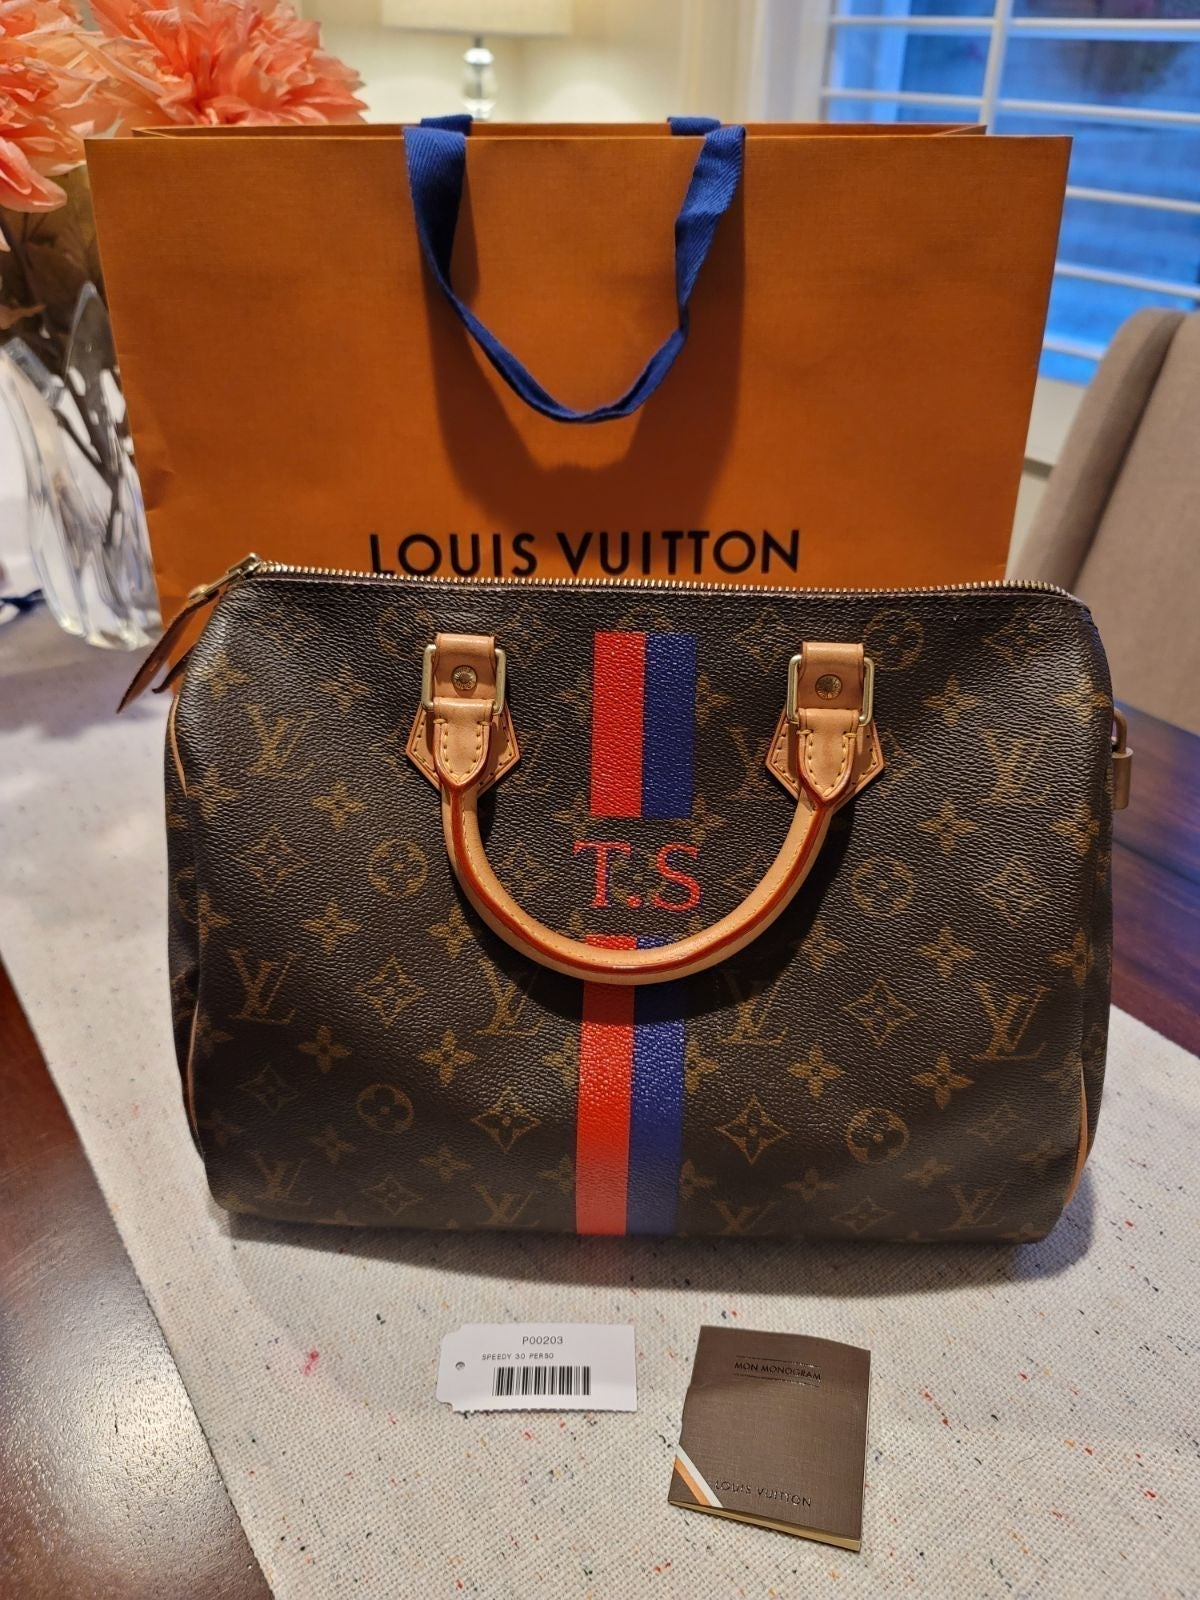 Louis Vuitton Speedy 30 heritage